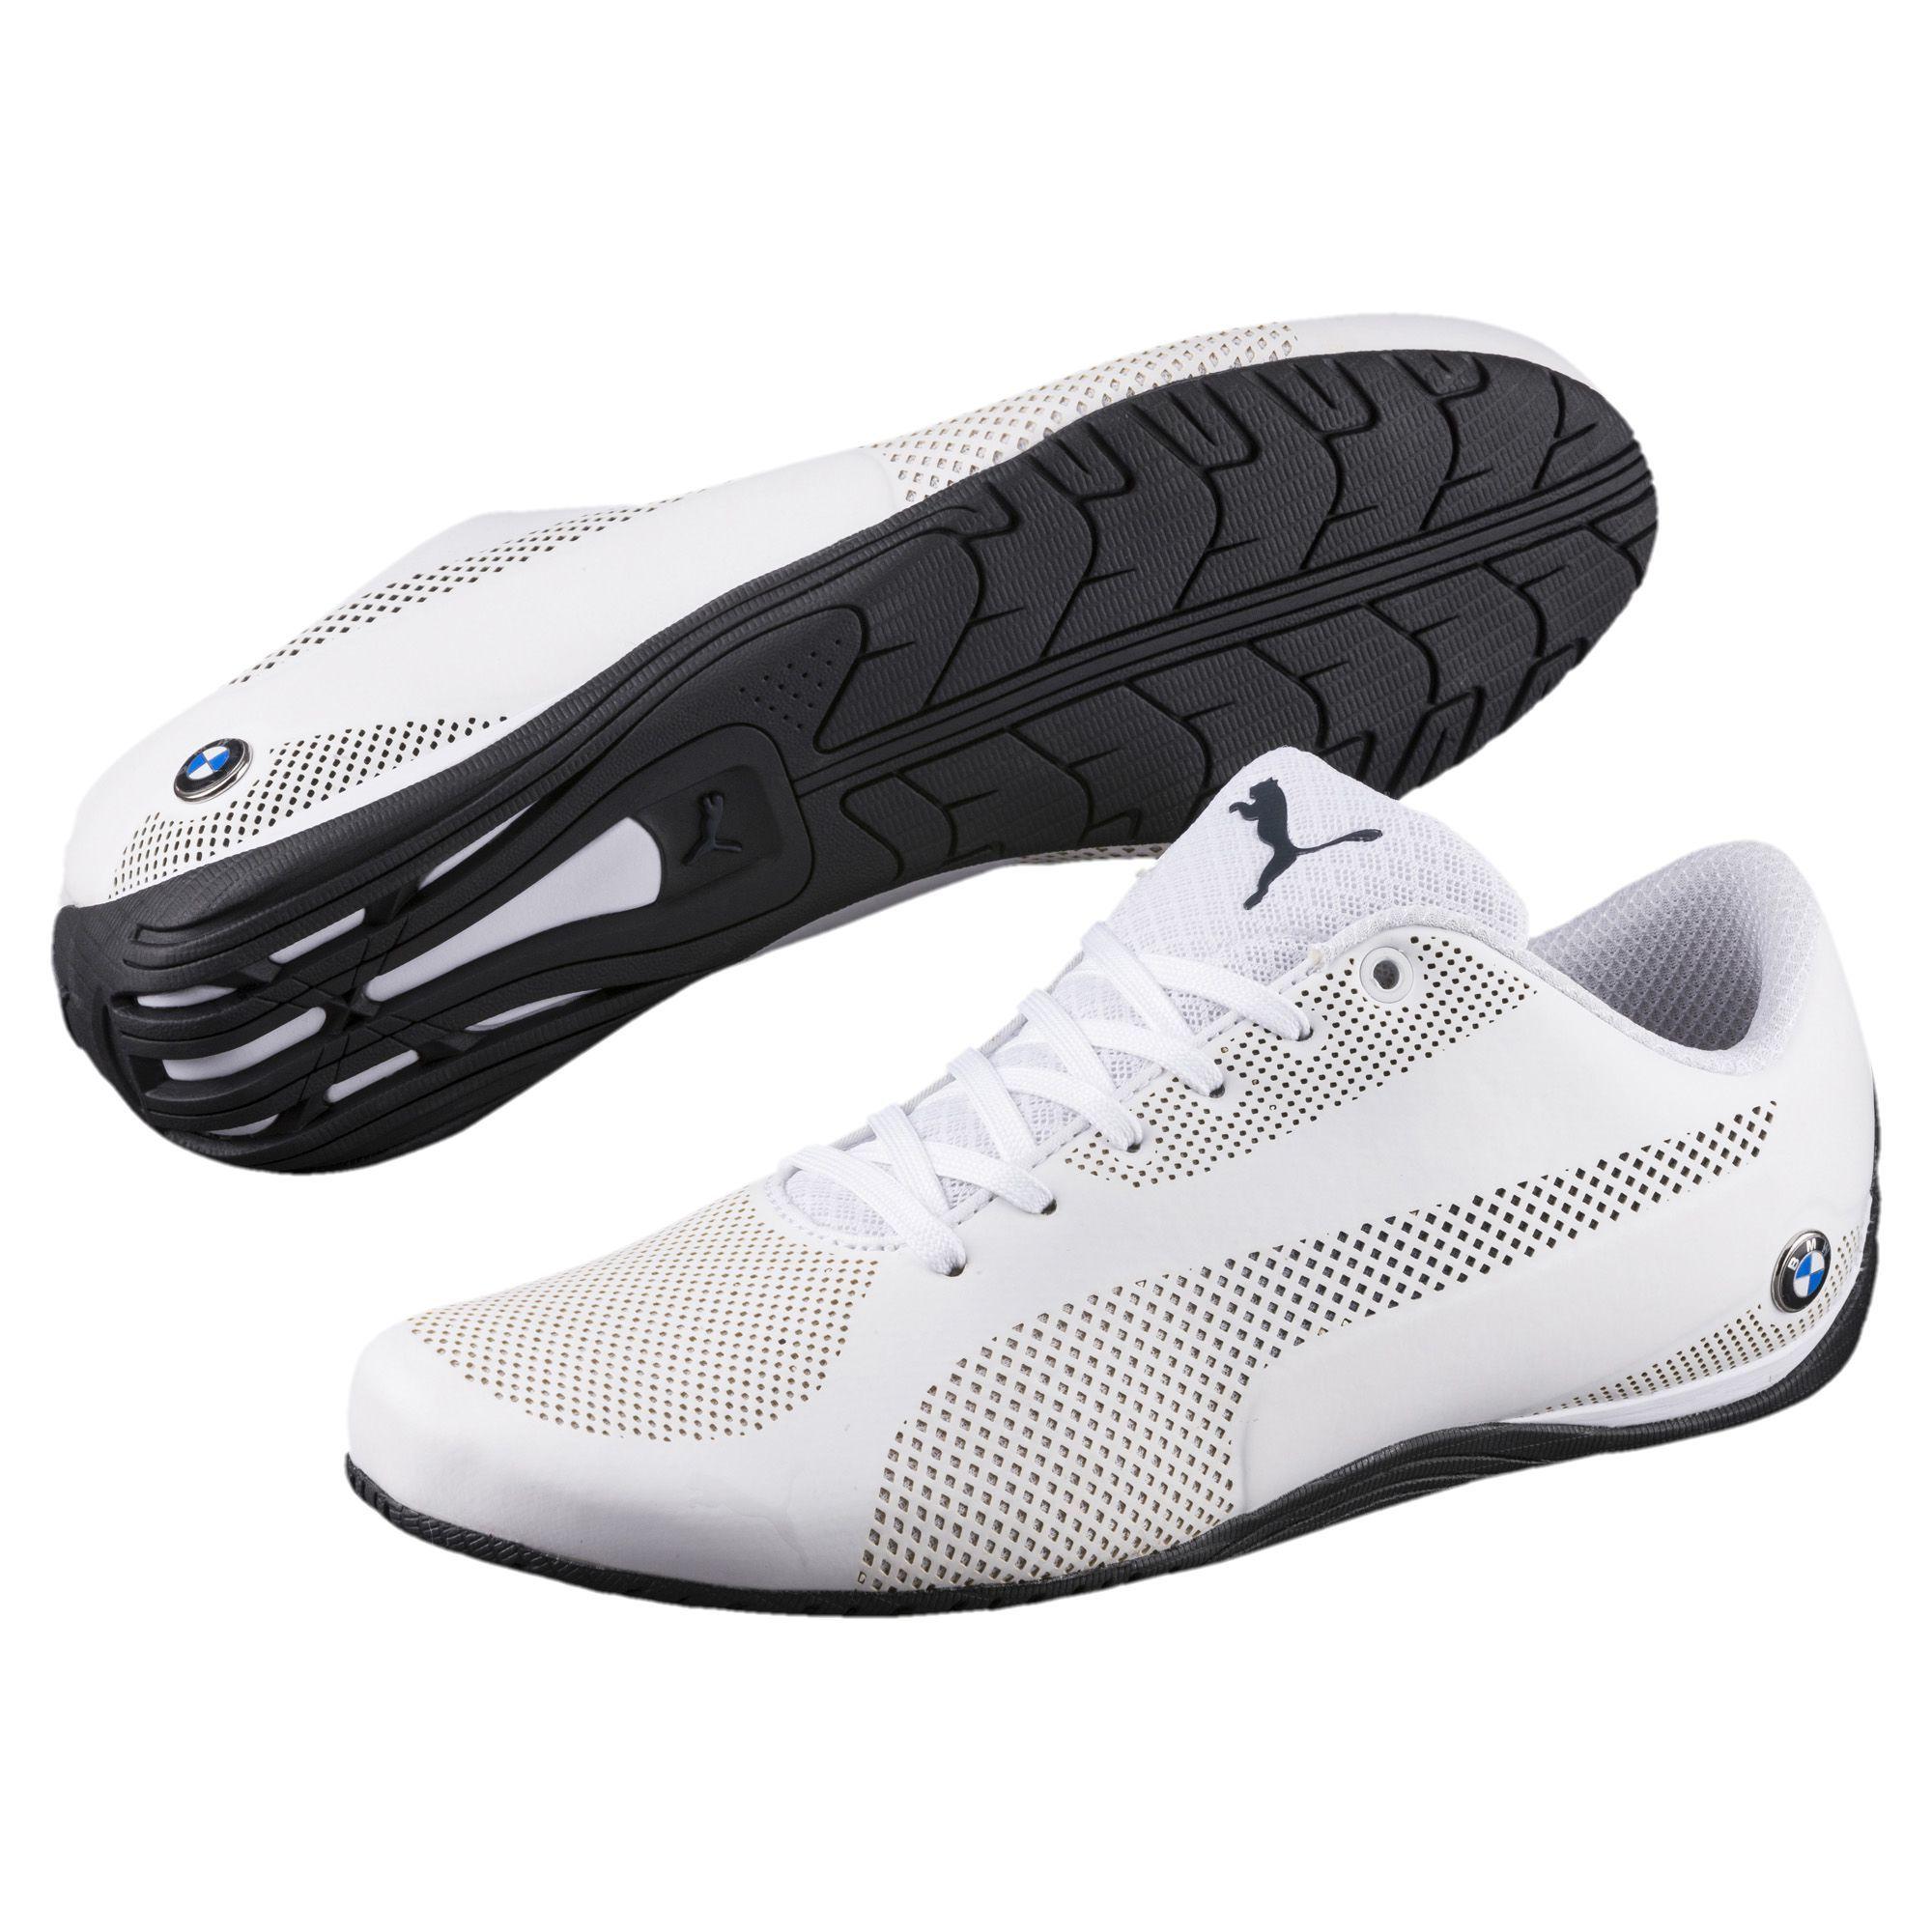 PUMA-BMW-Motorsport-Drift-Cat-5-Ultra-Training-Shoes-Men-Low-Boot-Auto-New 4f794640c